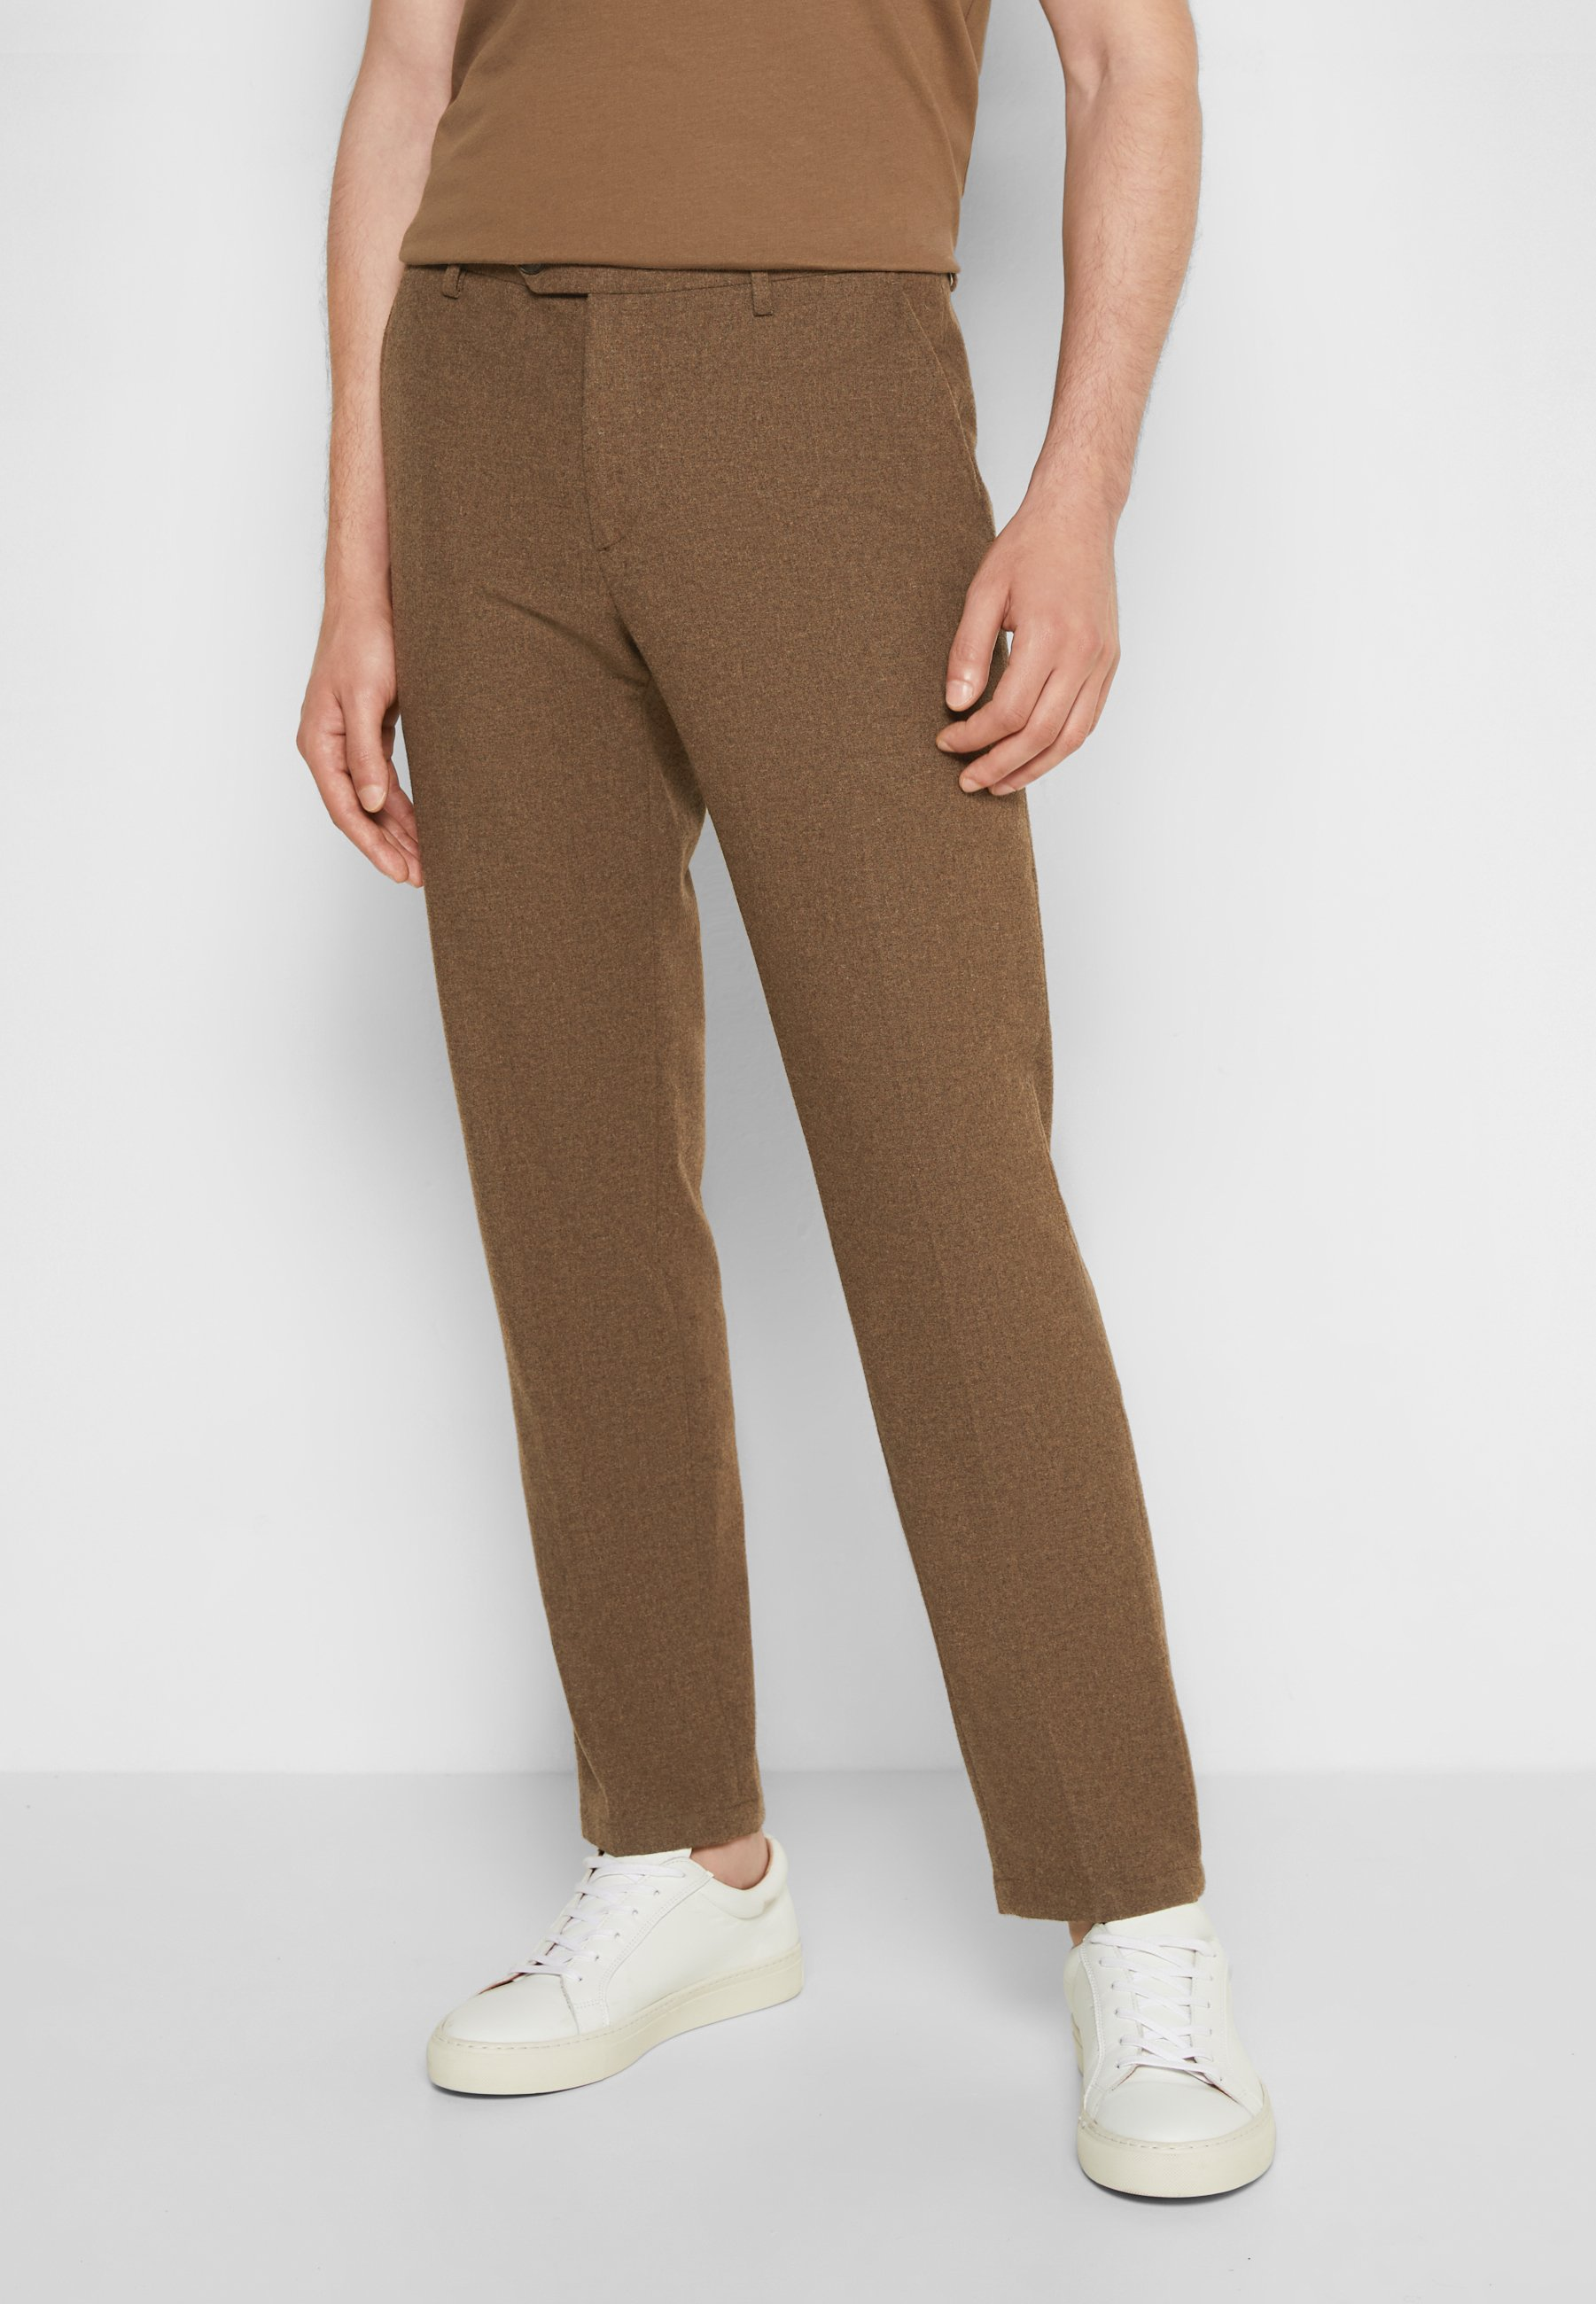 Uomo COMO REG PANTS - Pantaloni